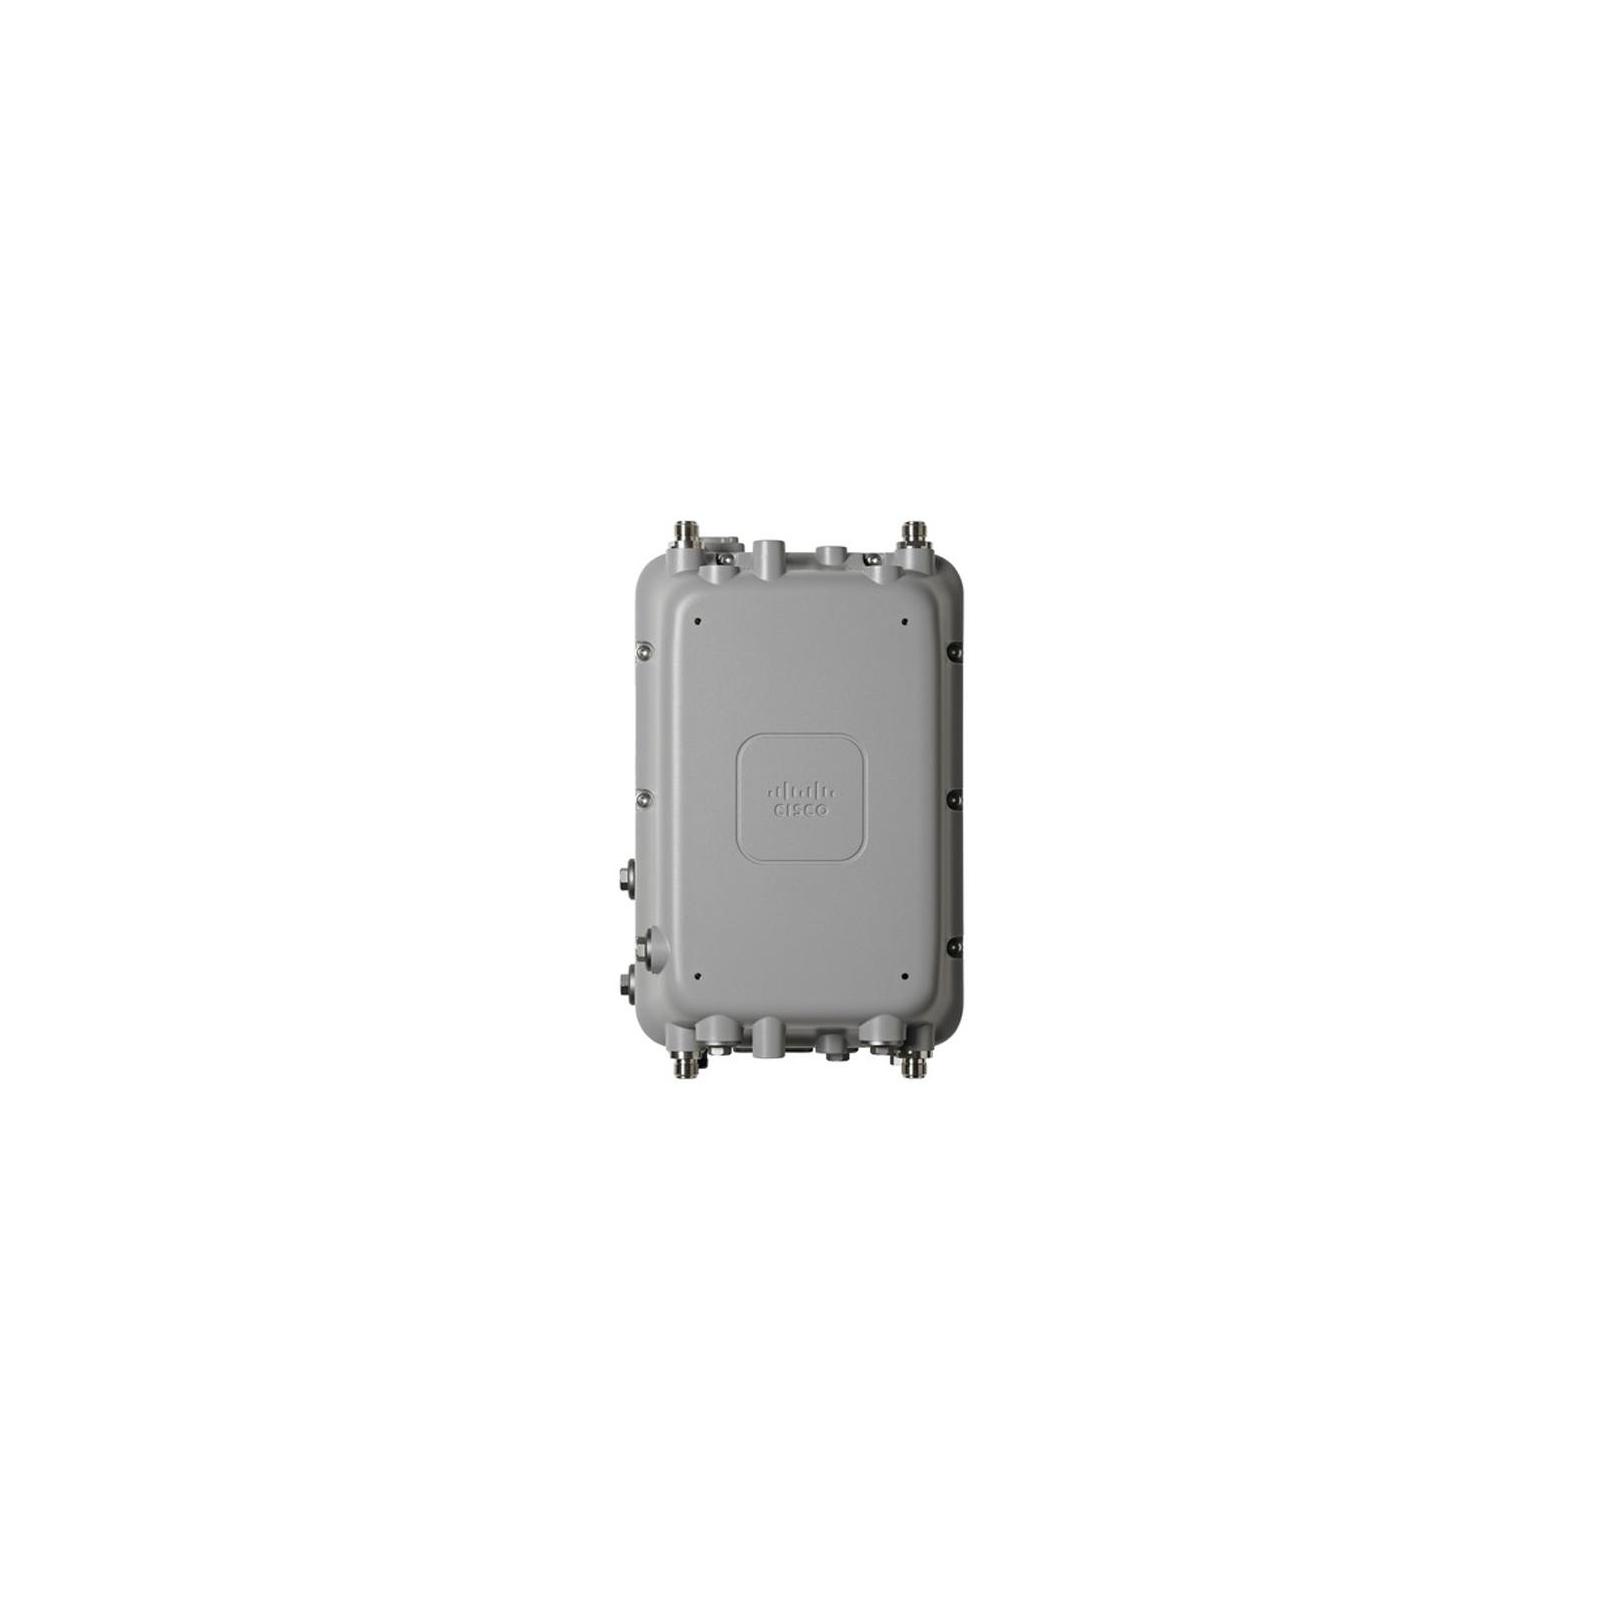 Точка доступа Wi-Fi Cisco AIR-AP1572EAC-E-K9 изображение 2